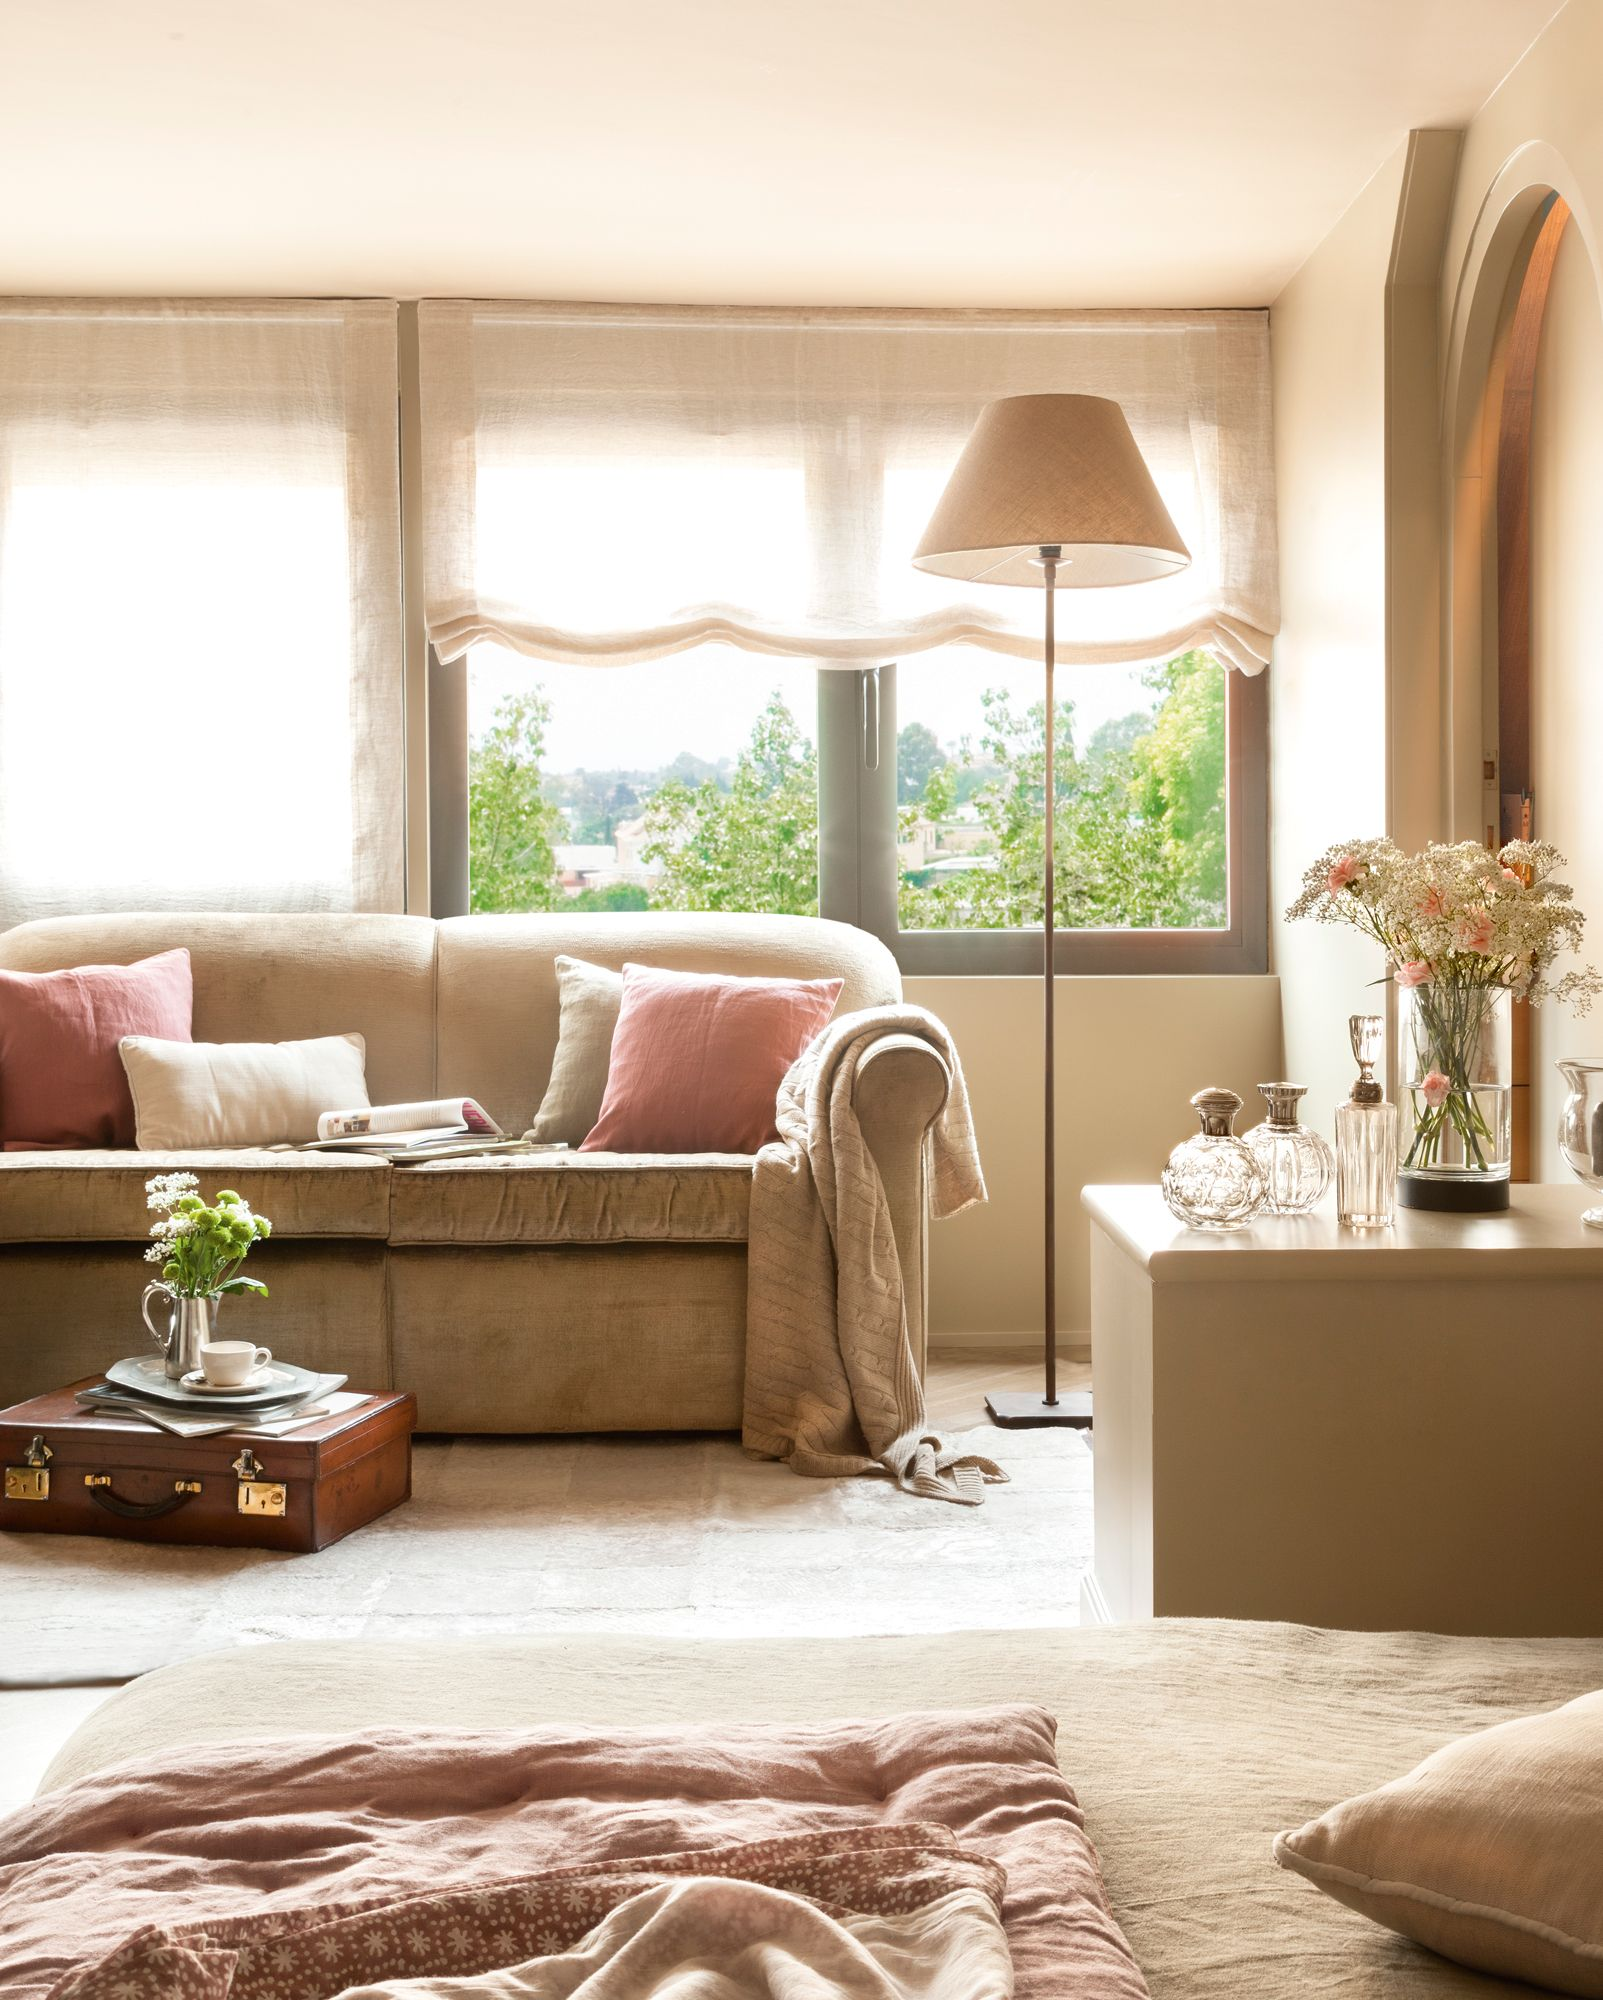 17 sal n en tonos beige con sof l mpara de pie cortinas for Plaids para sofa